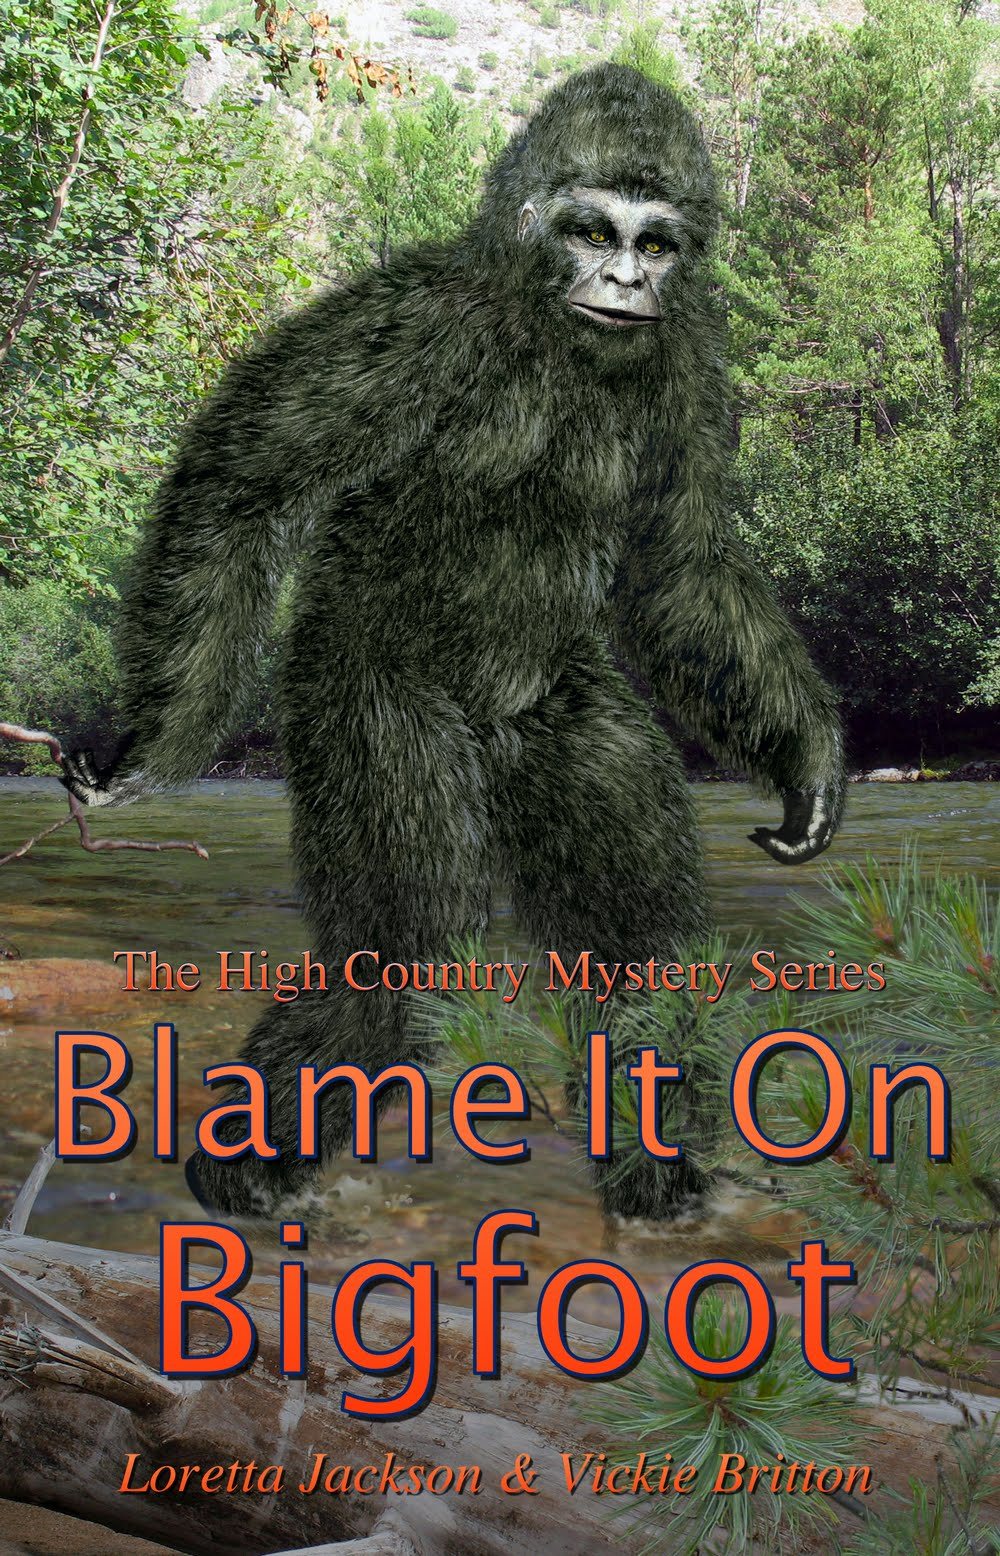 BLAME IT ON BIGFOOT